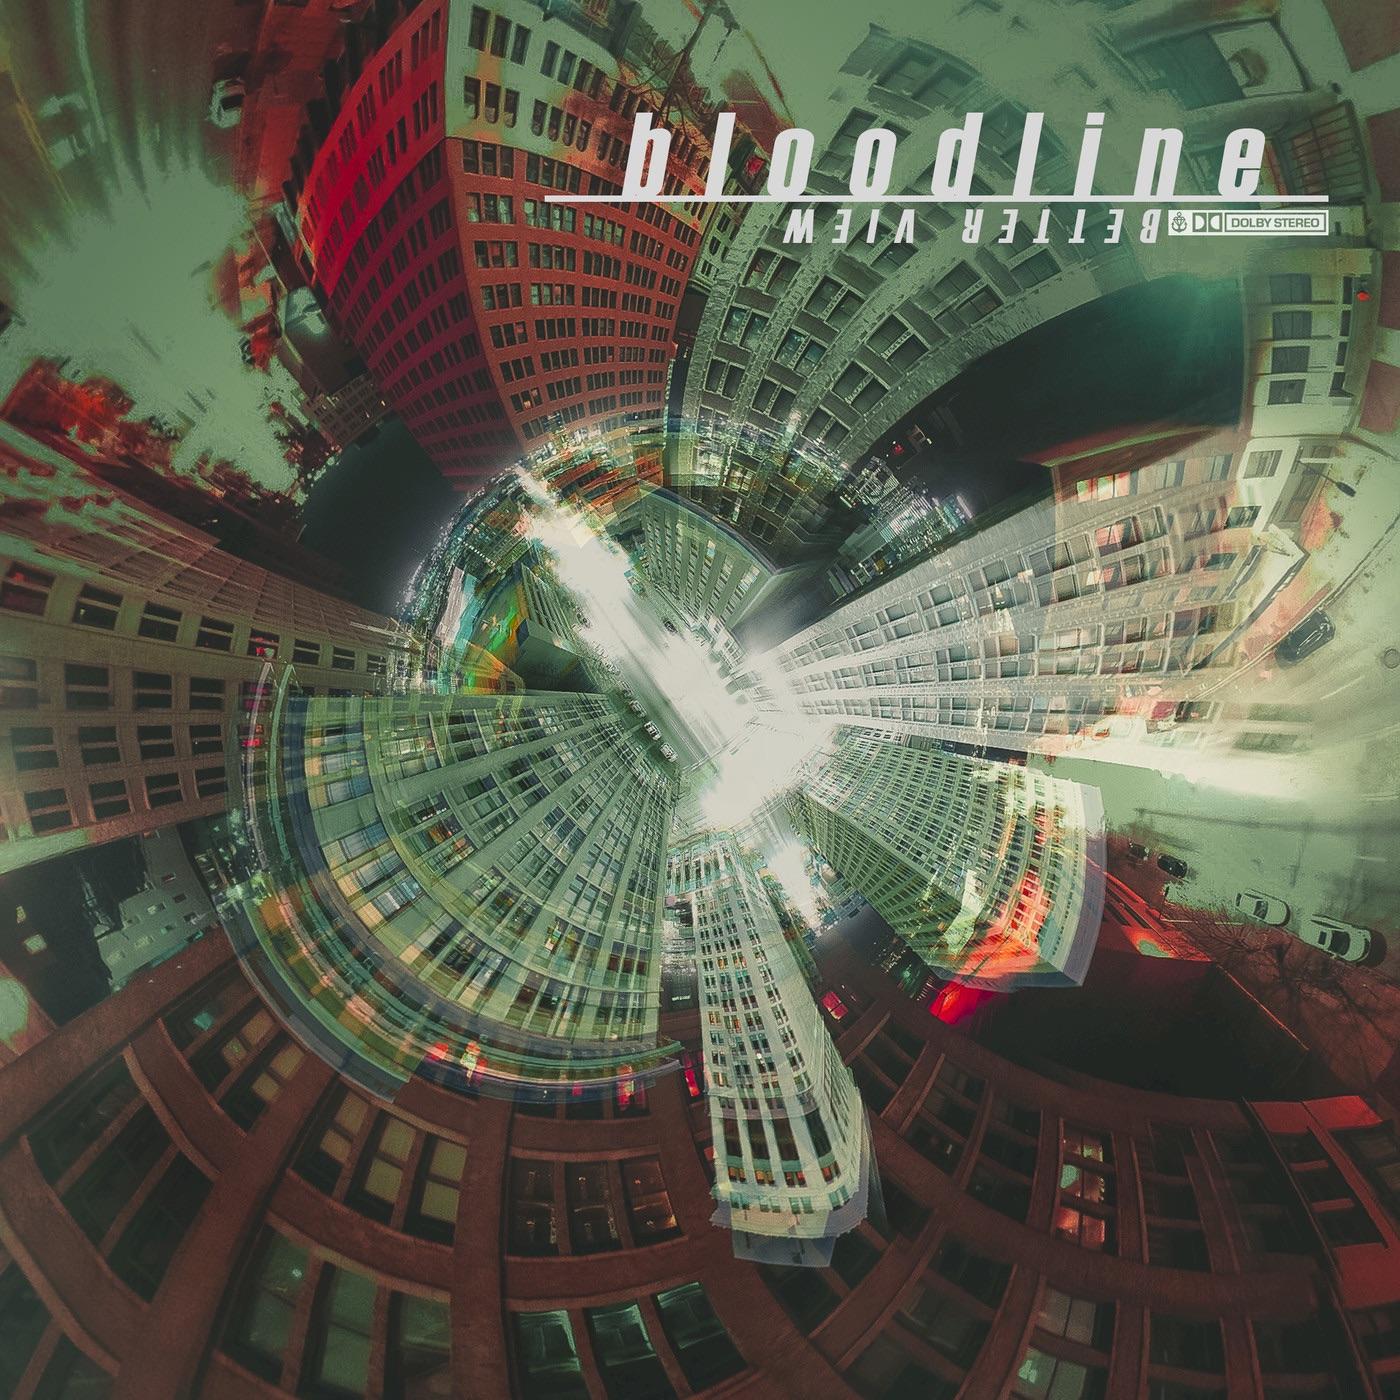 Bloodline - Better View (2019)